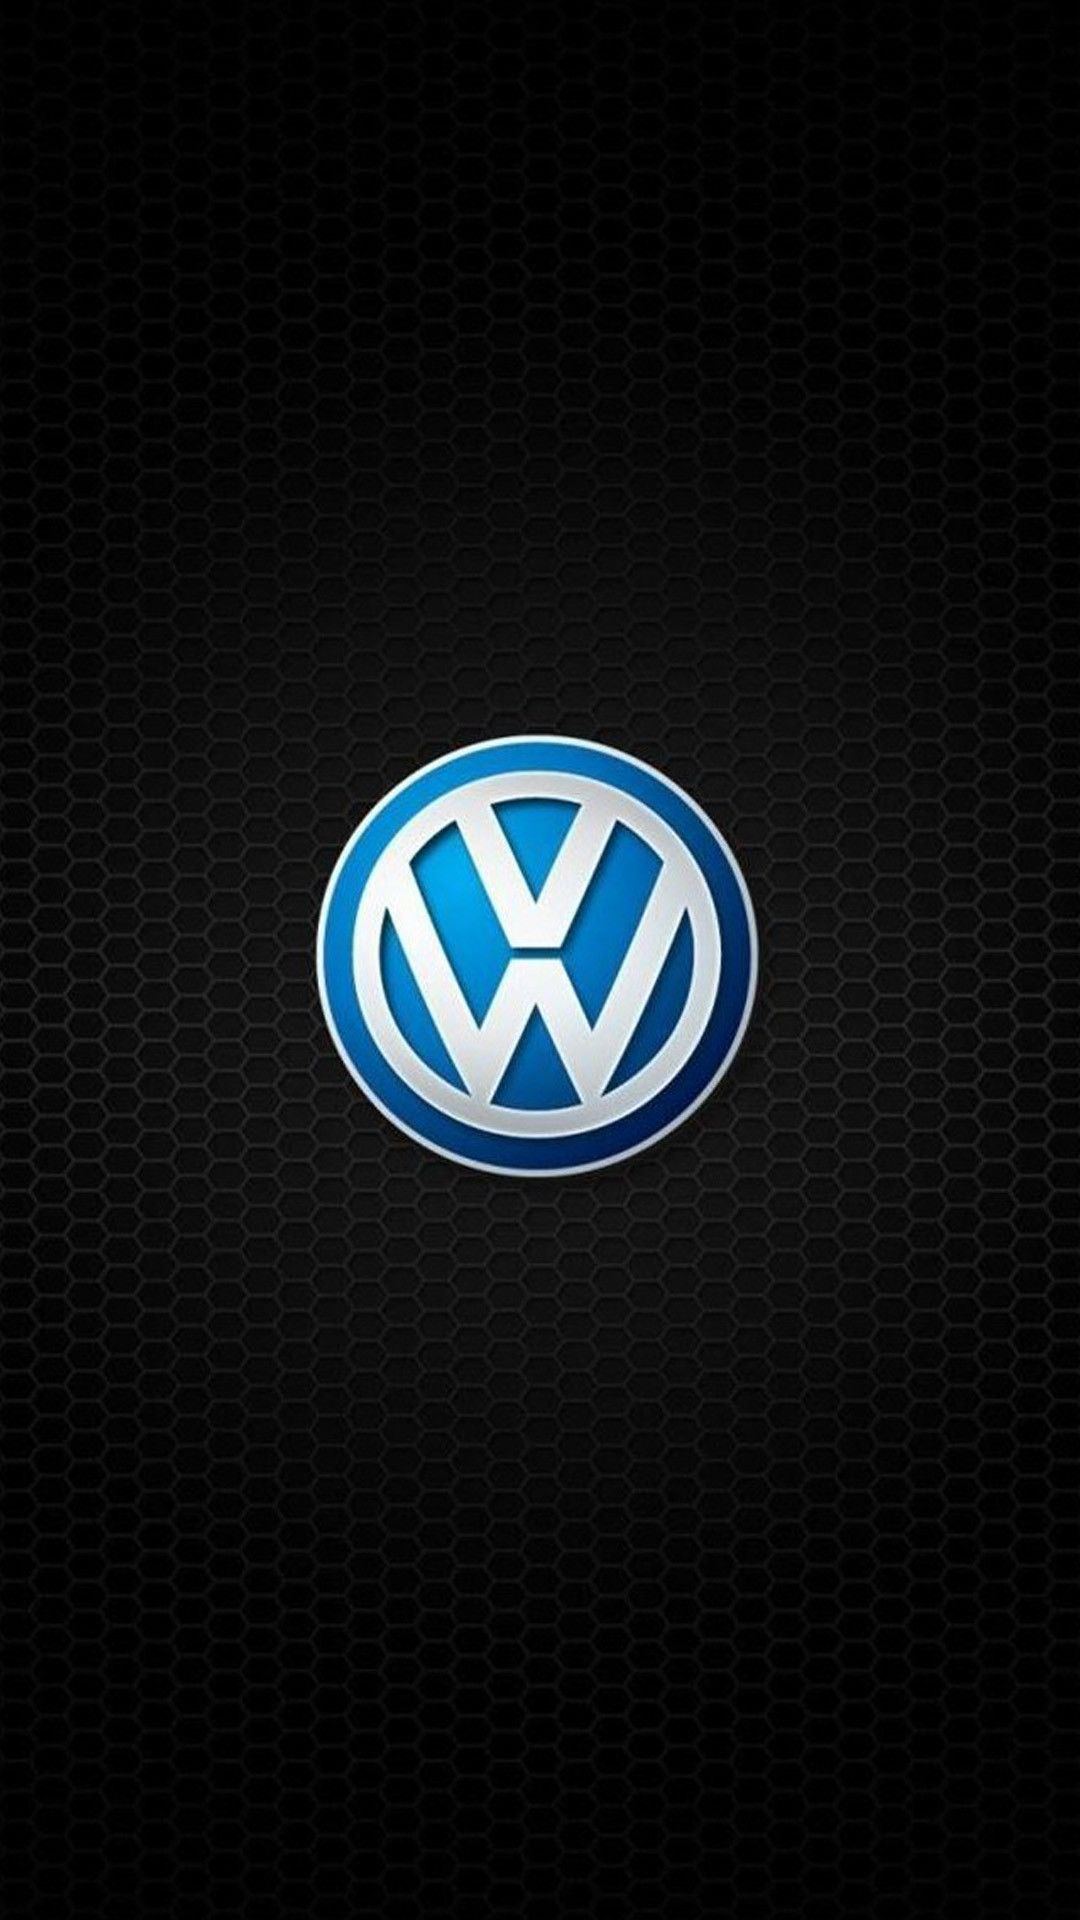 Logo Bmw Iphone Background > Flip Wallpapers > Download